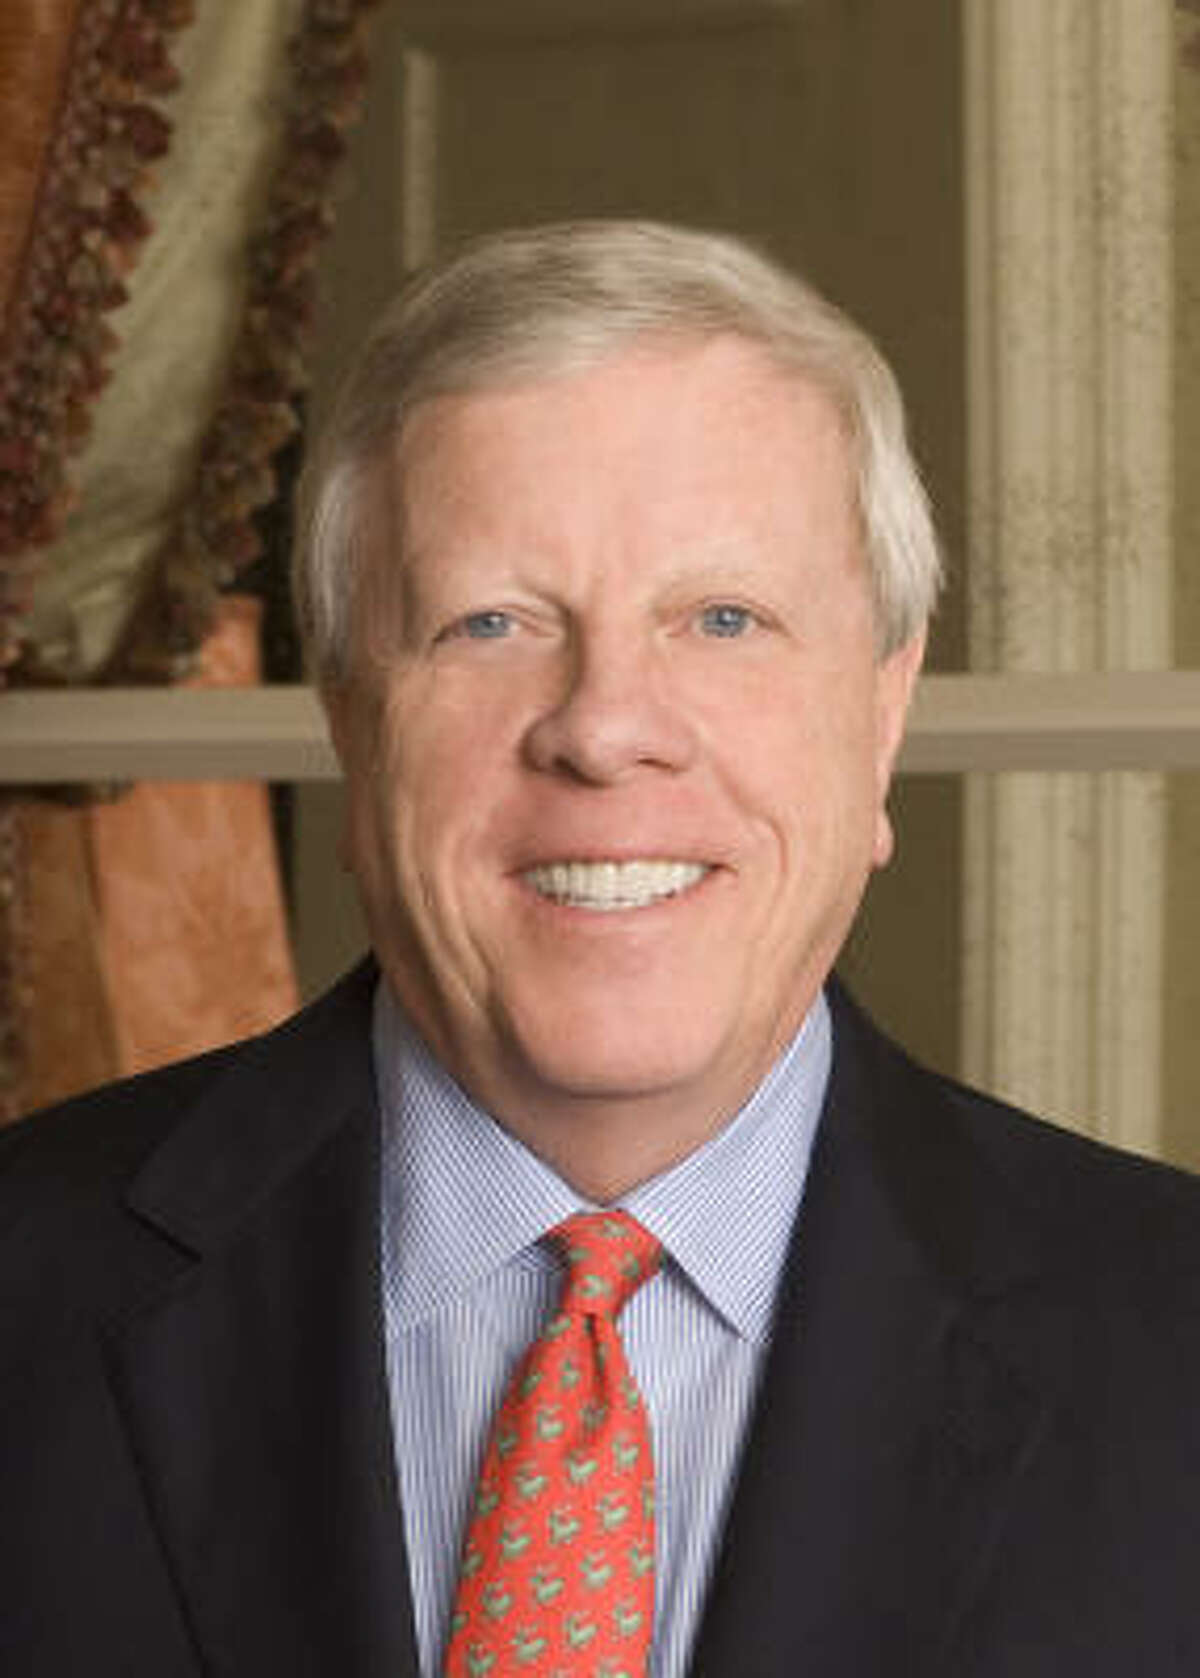 Richard Kinder of HoustonRank: 128Net worth: $7.4 billlion